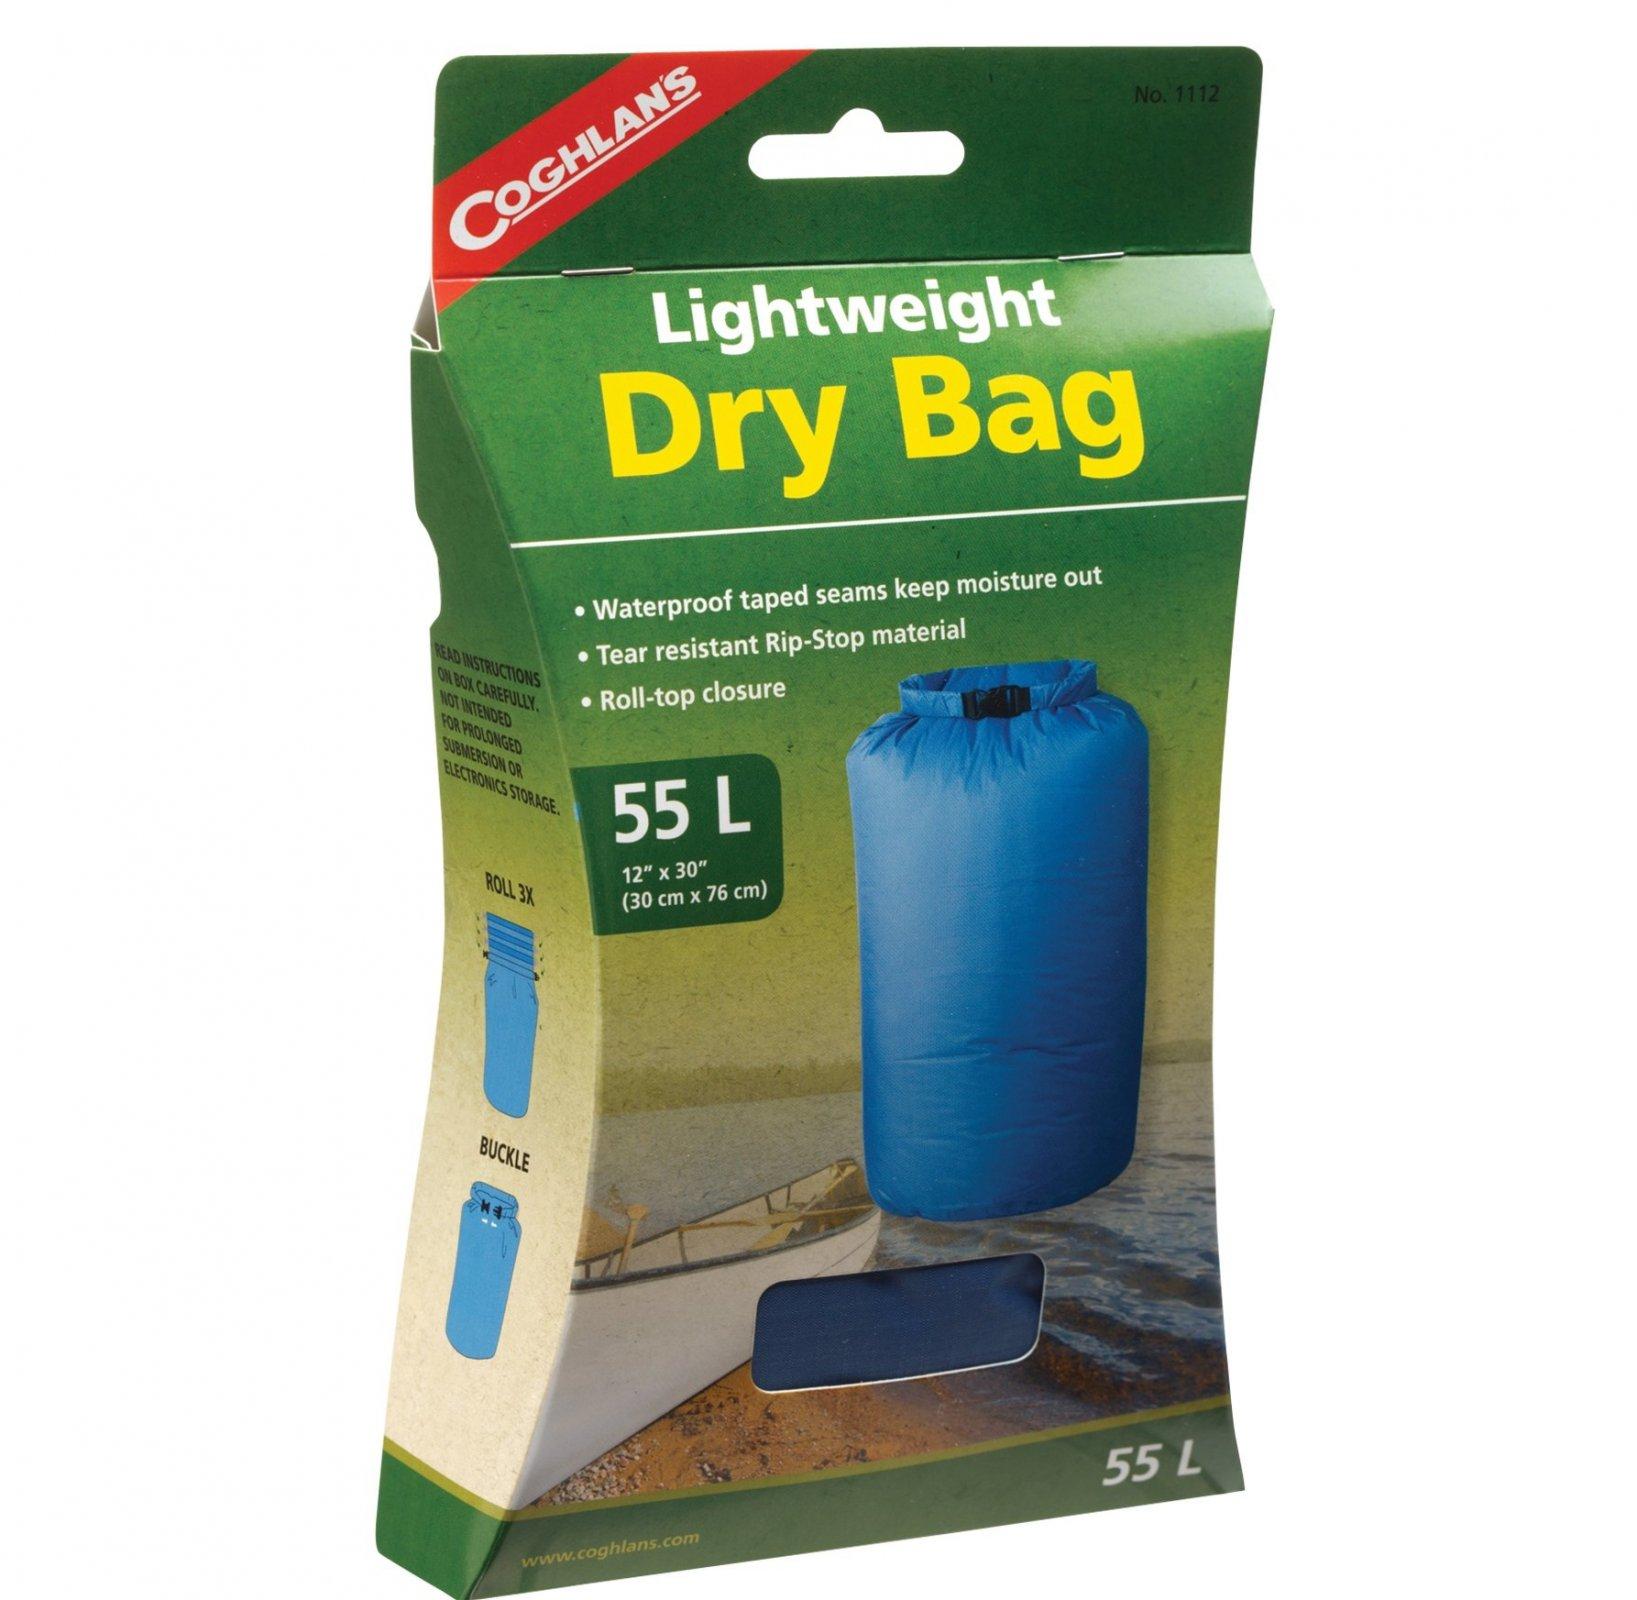 Dry Bag Lightweight Coghlan's